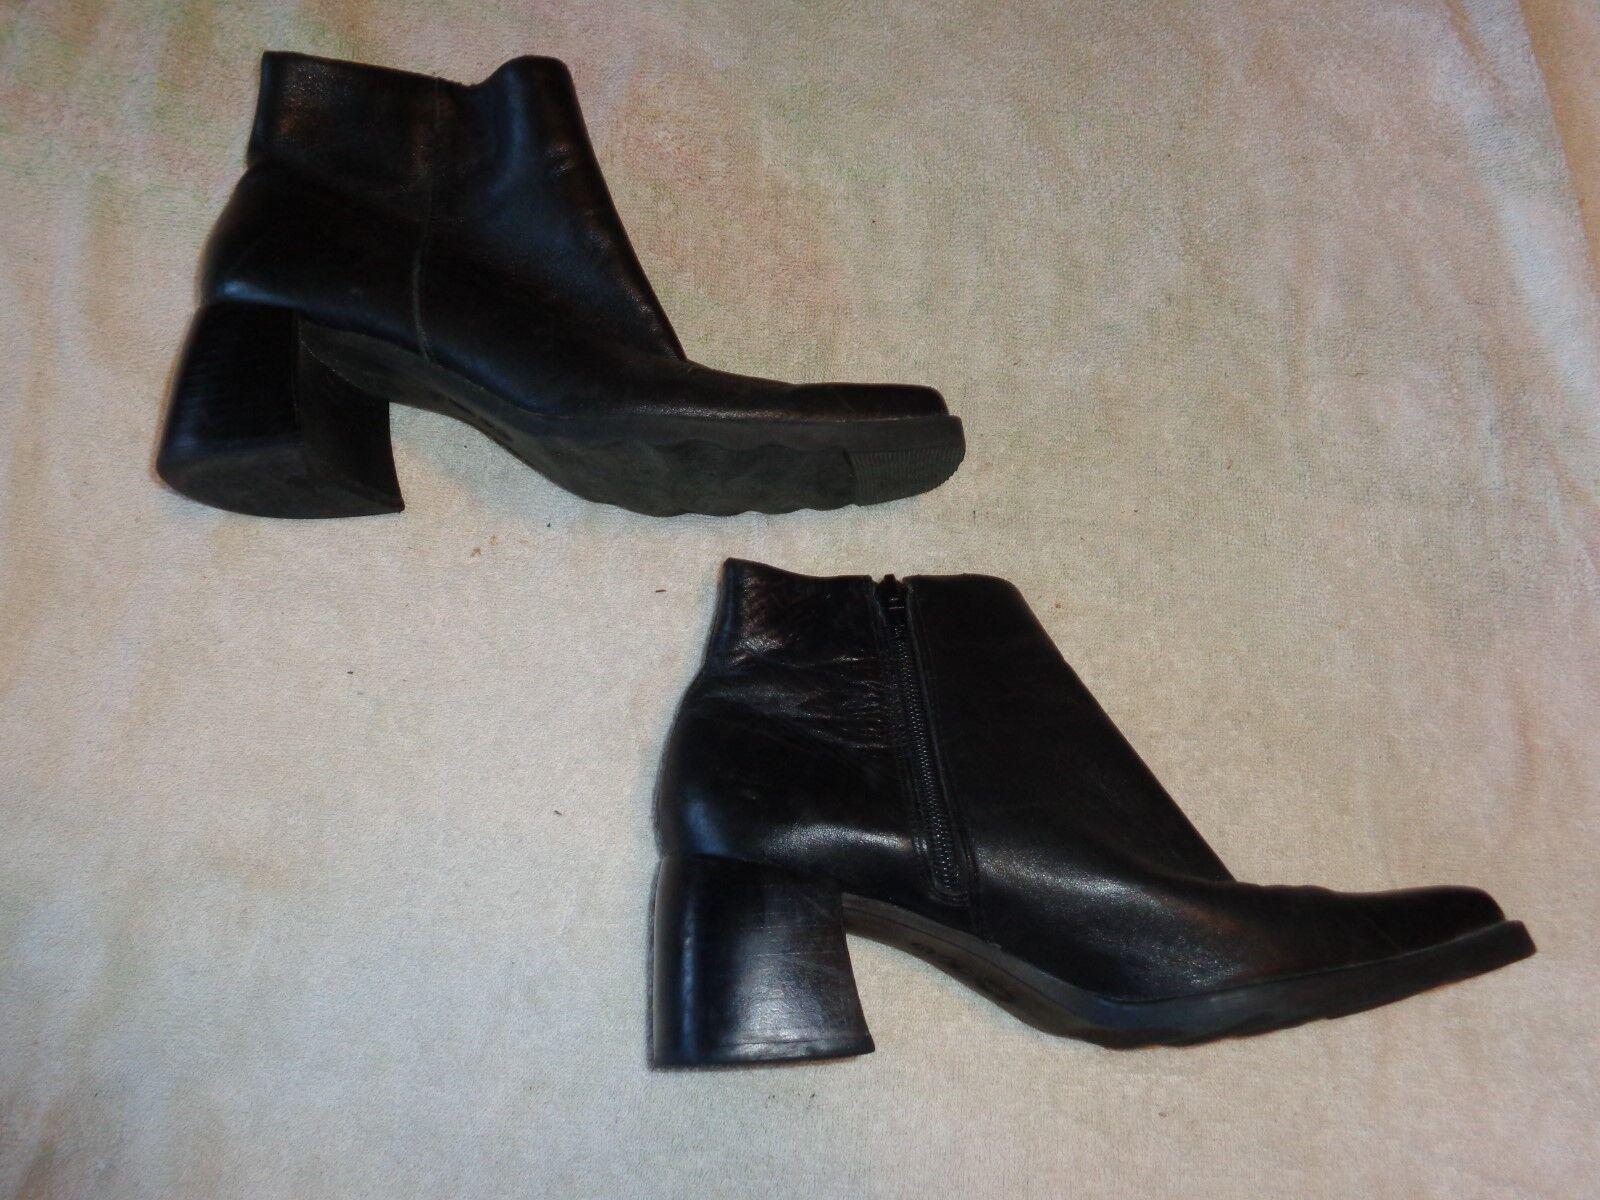 CALICO BLACK ZIPPER BOOTS WOMENS  SIZE 7 M   WOMENS SIDNEY e5d516